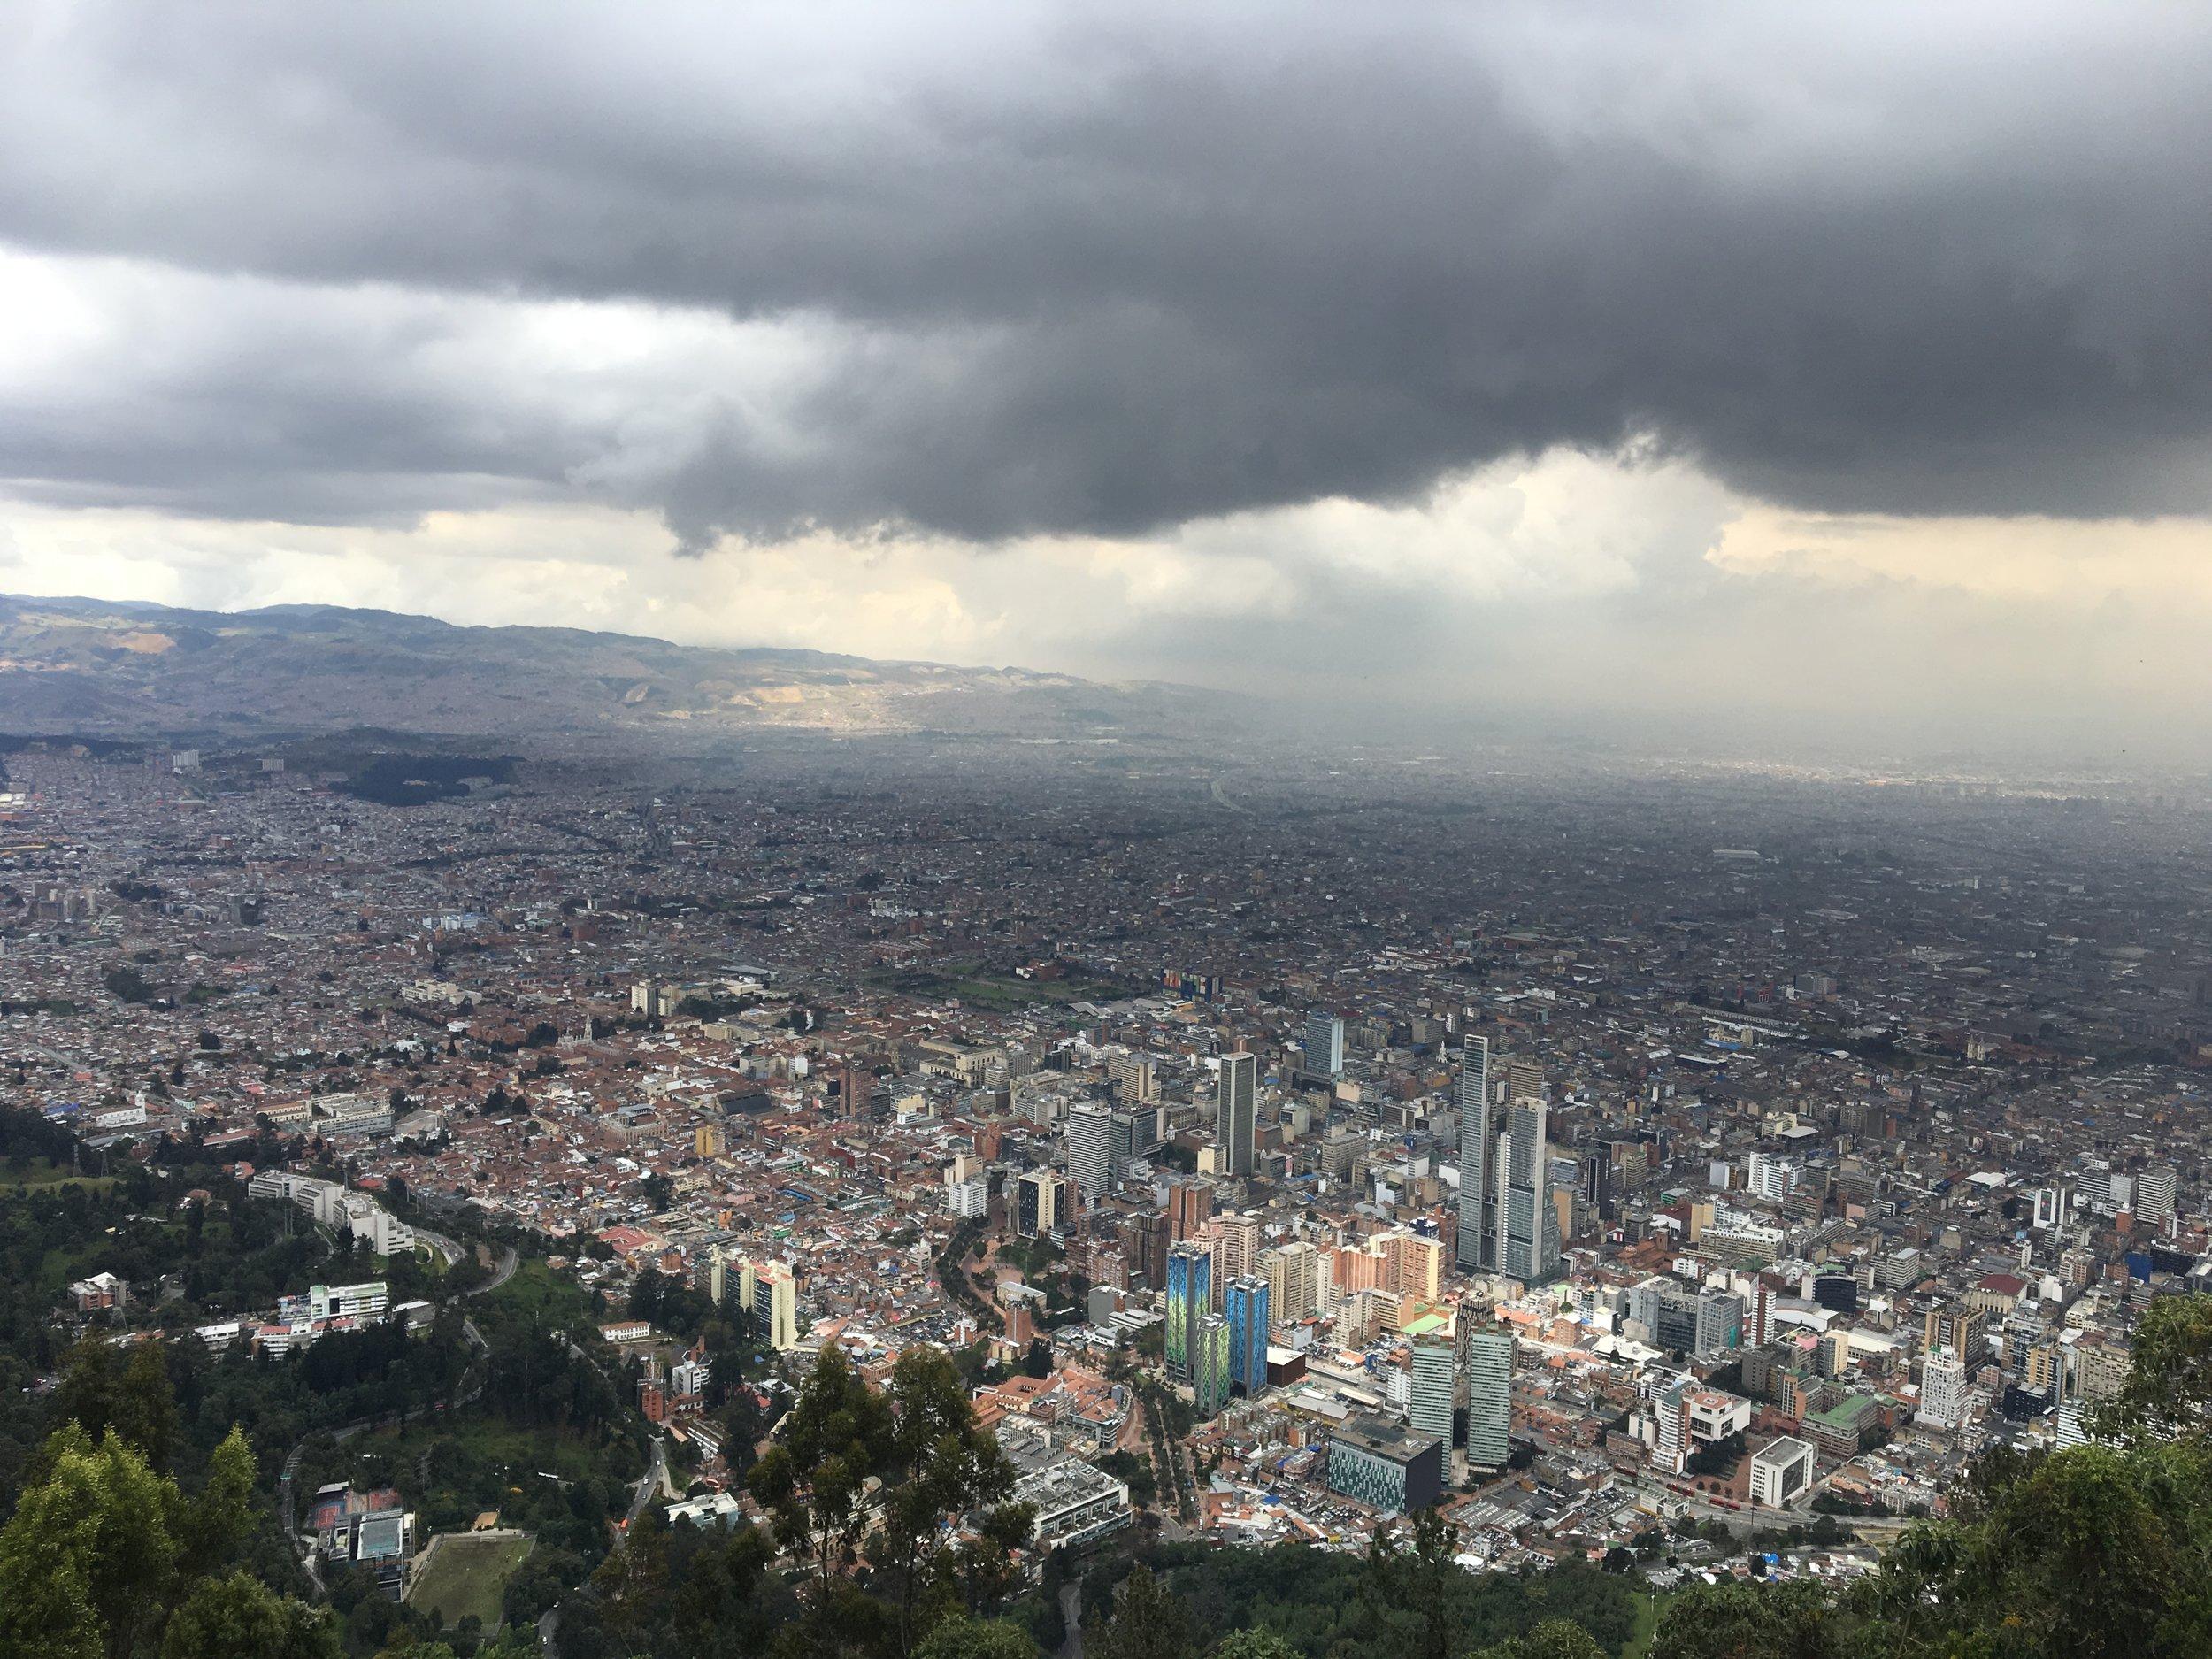 View over Bogotá